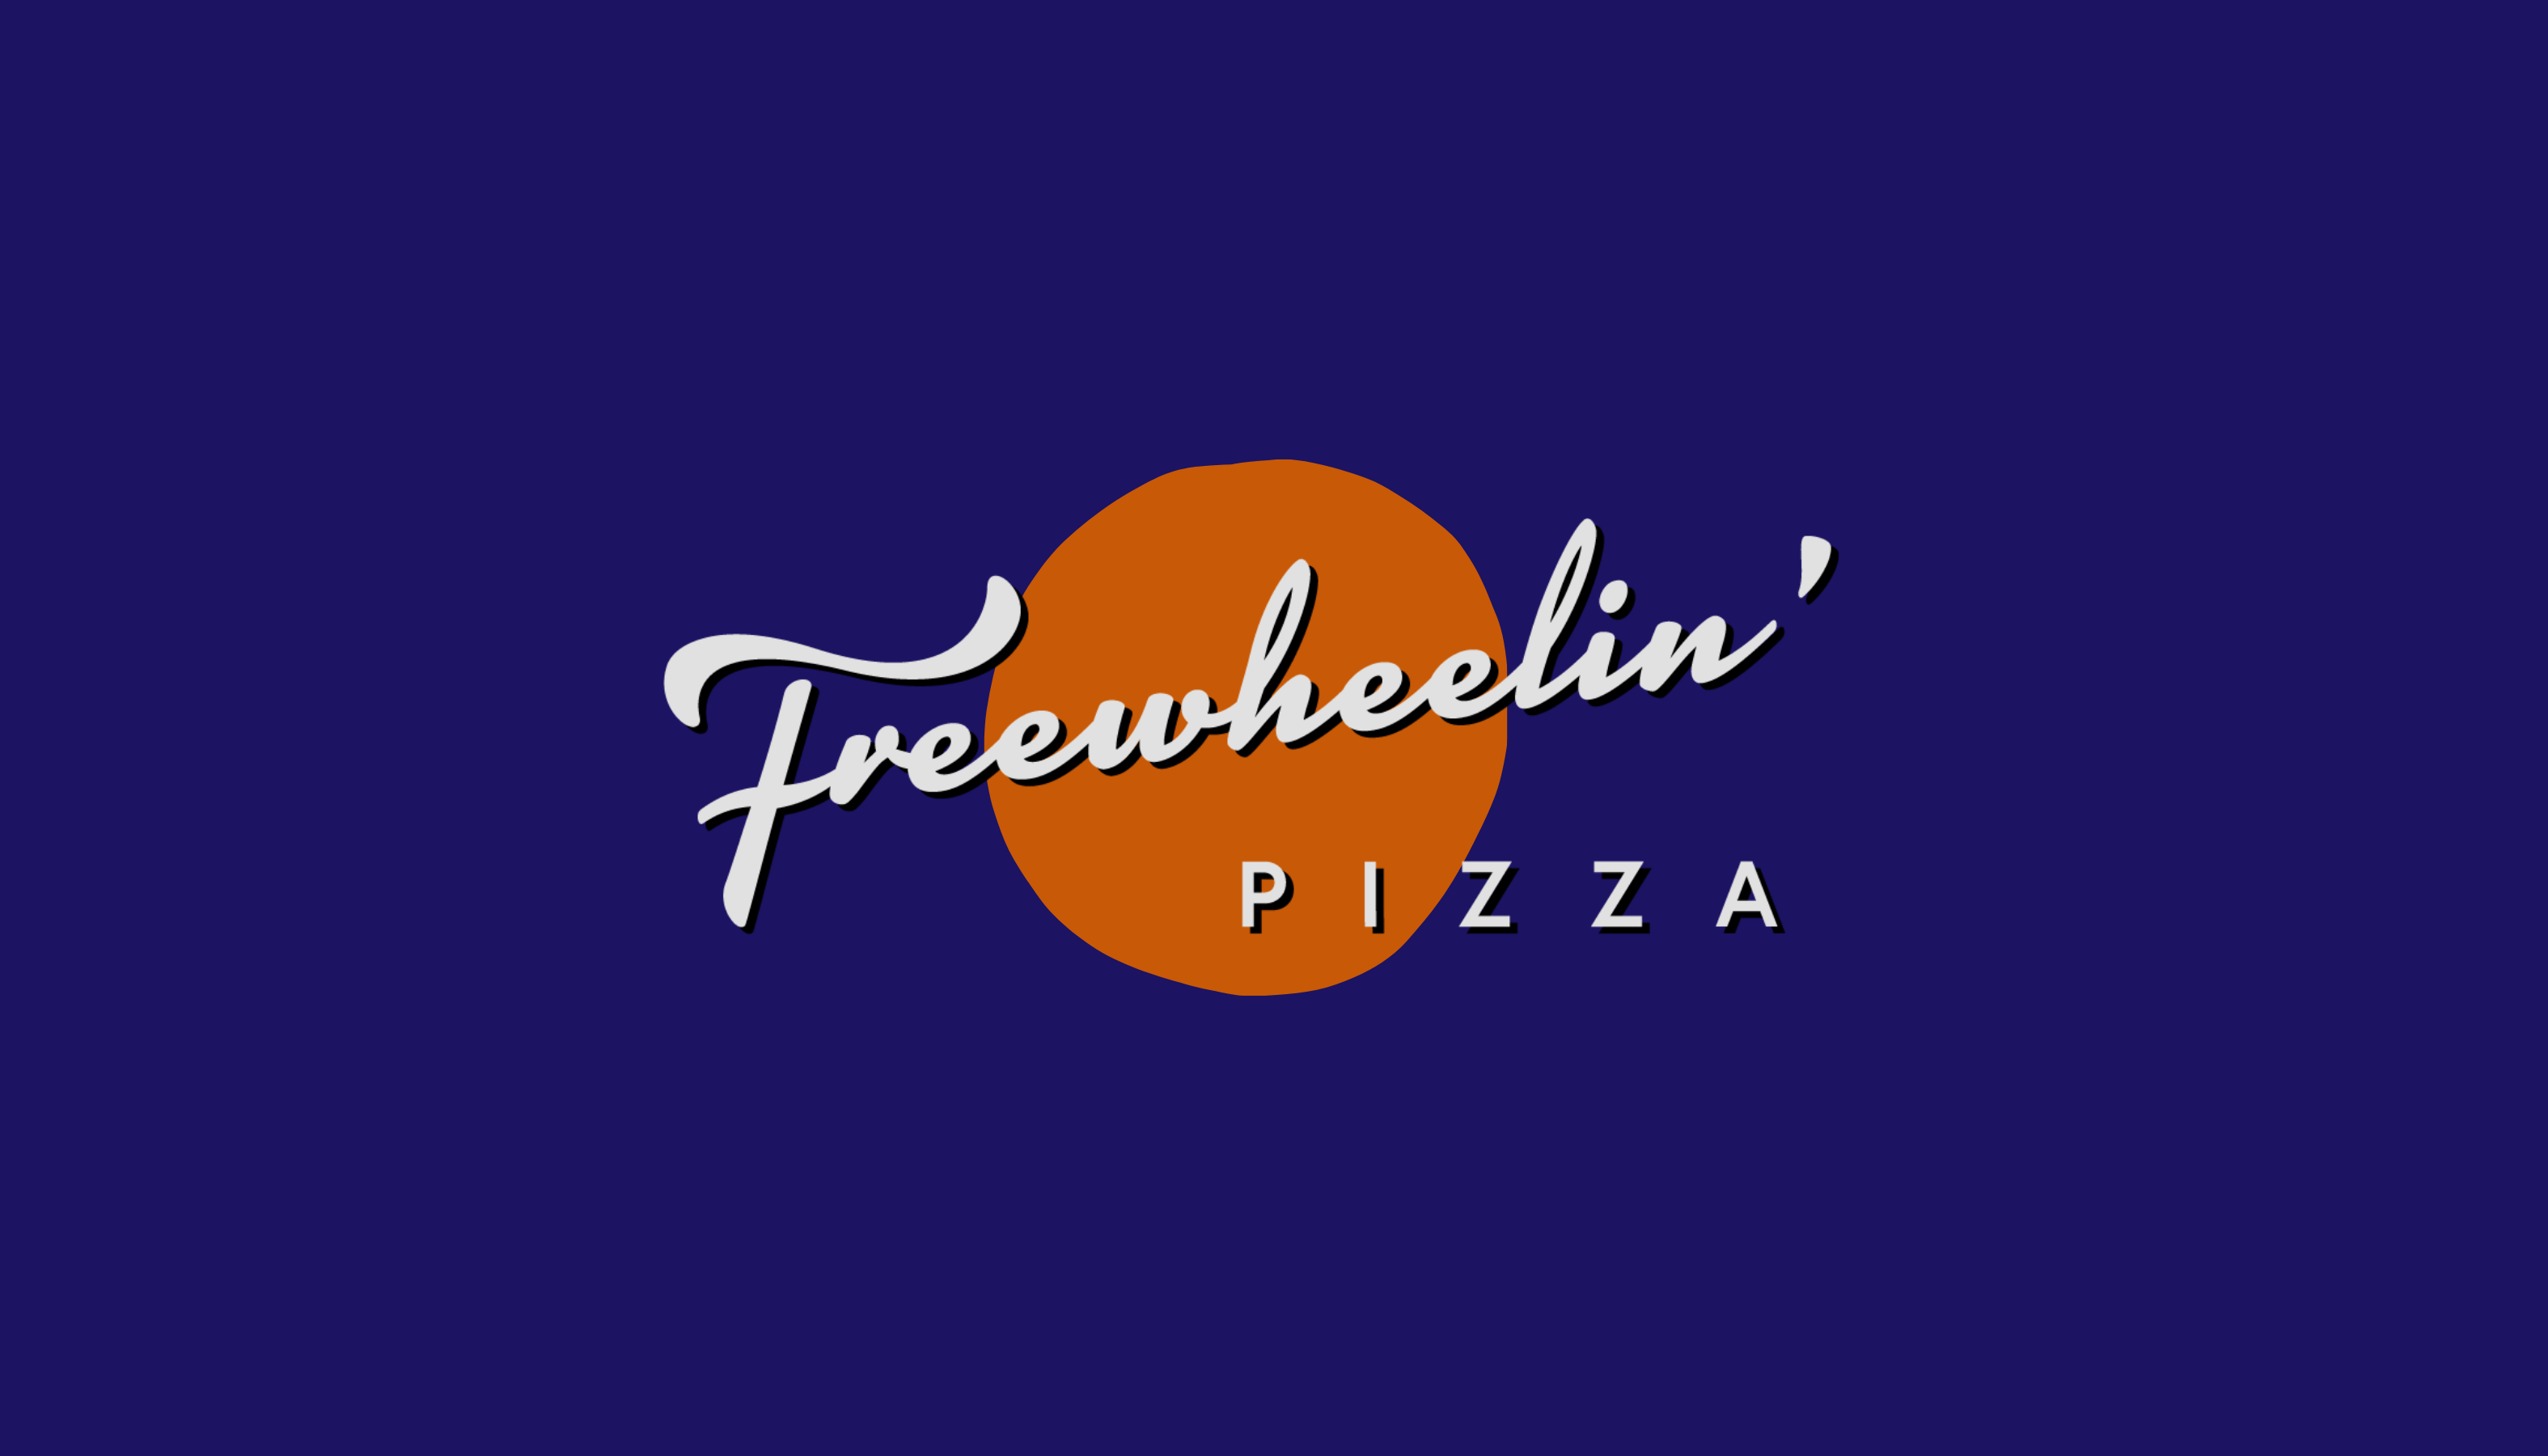 Freewheelin' Pizza